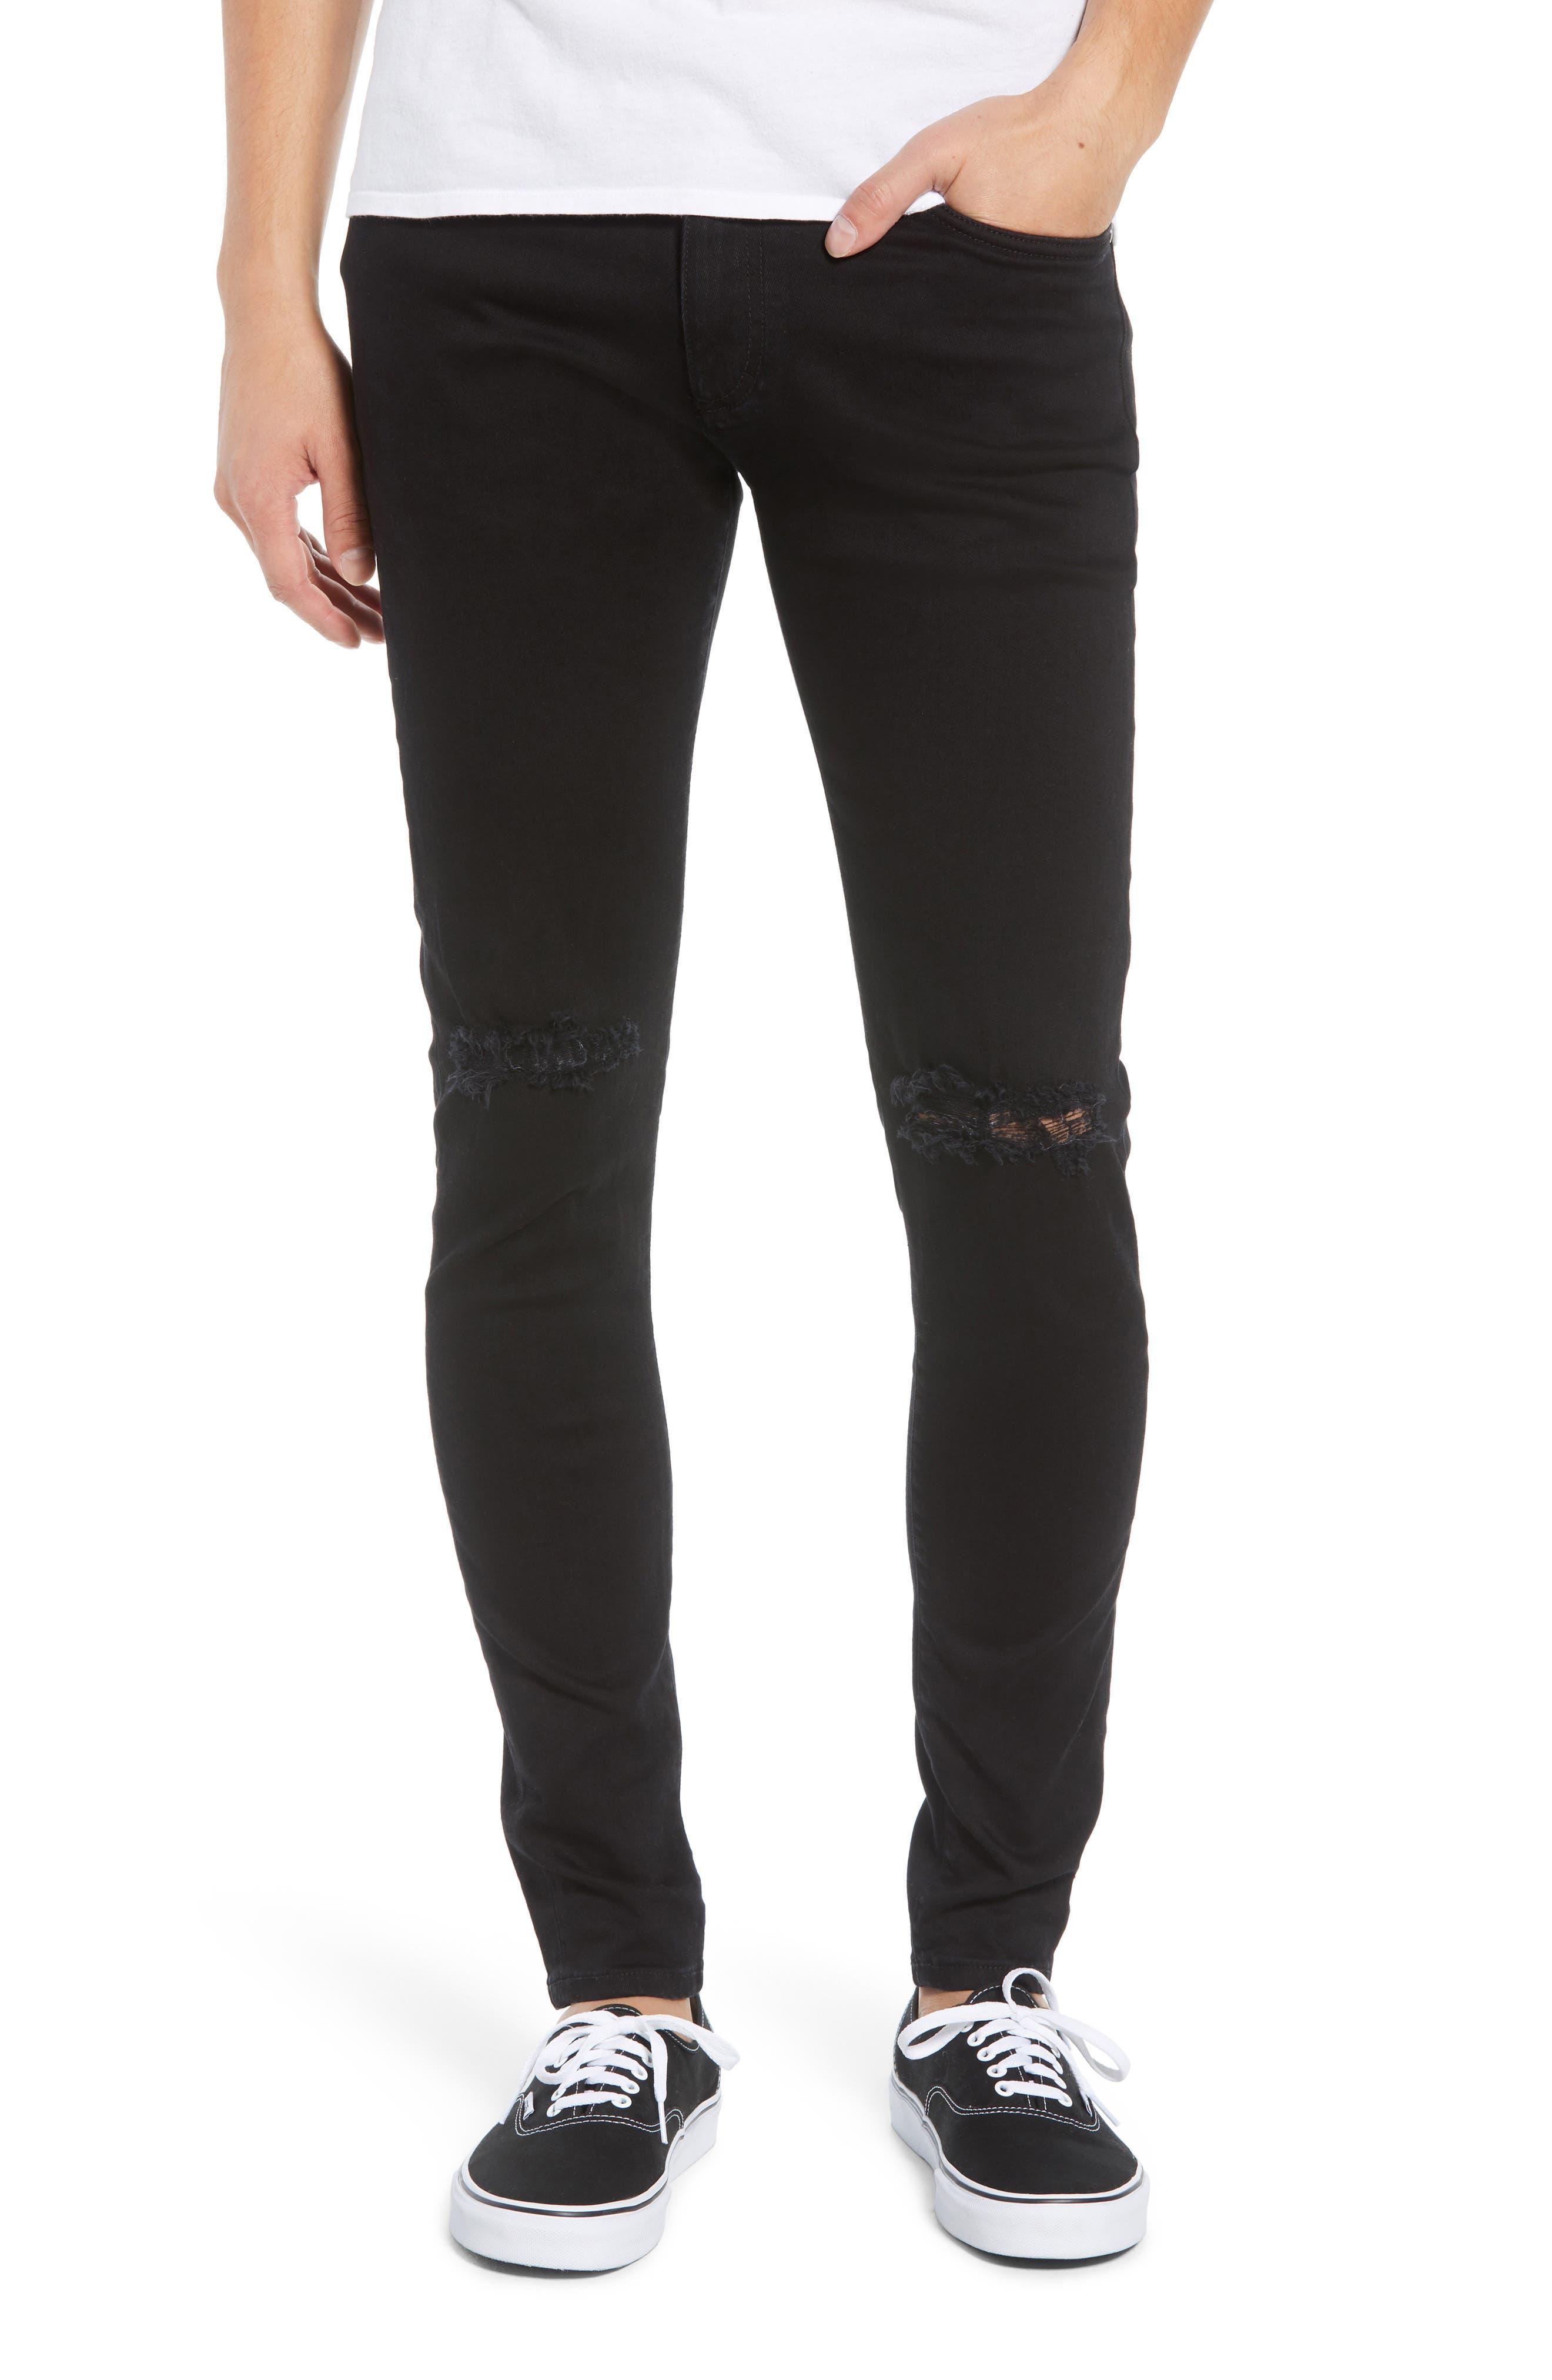 Destroyer Ripped Slim Fit Jeans,                         Main,                         color, BLACK